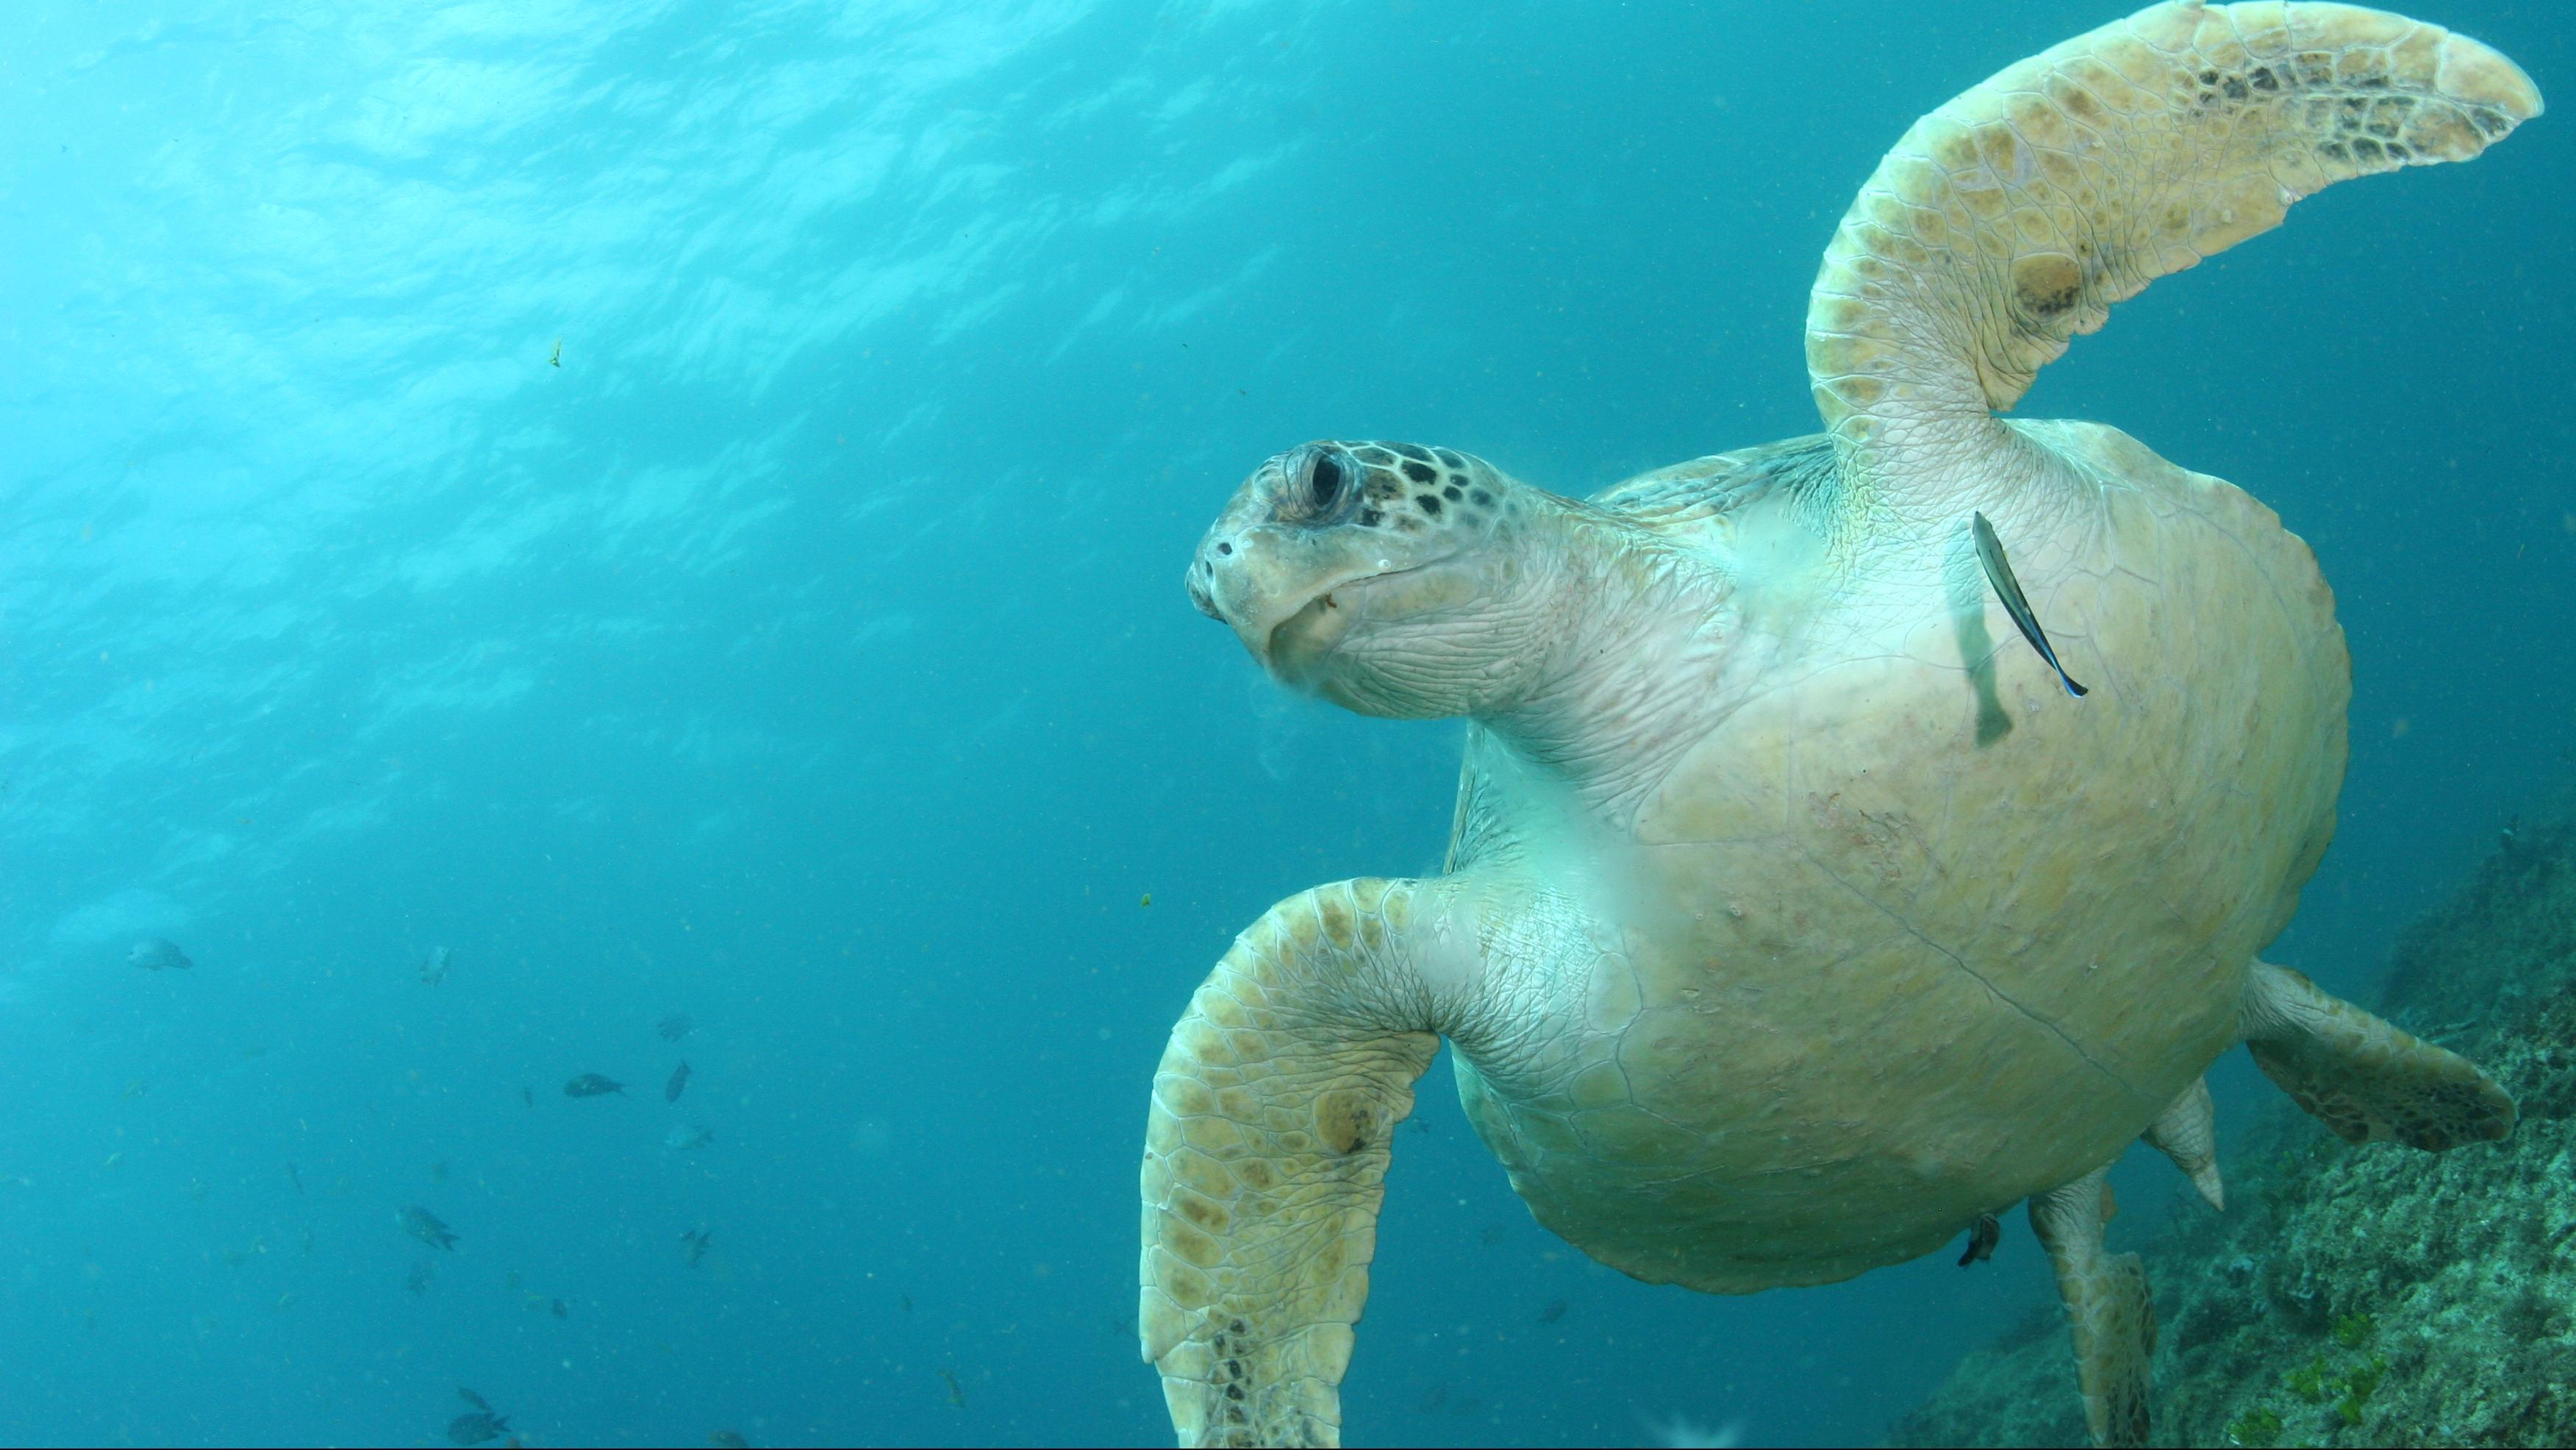 green_turtle_at_north_stradbroke_island_by_kathy_townsend.jpg